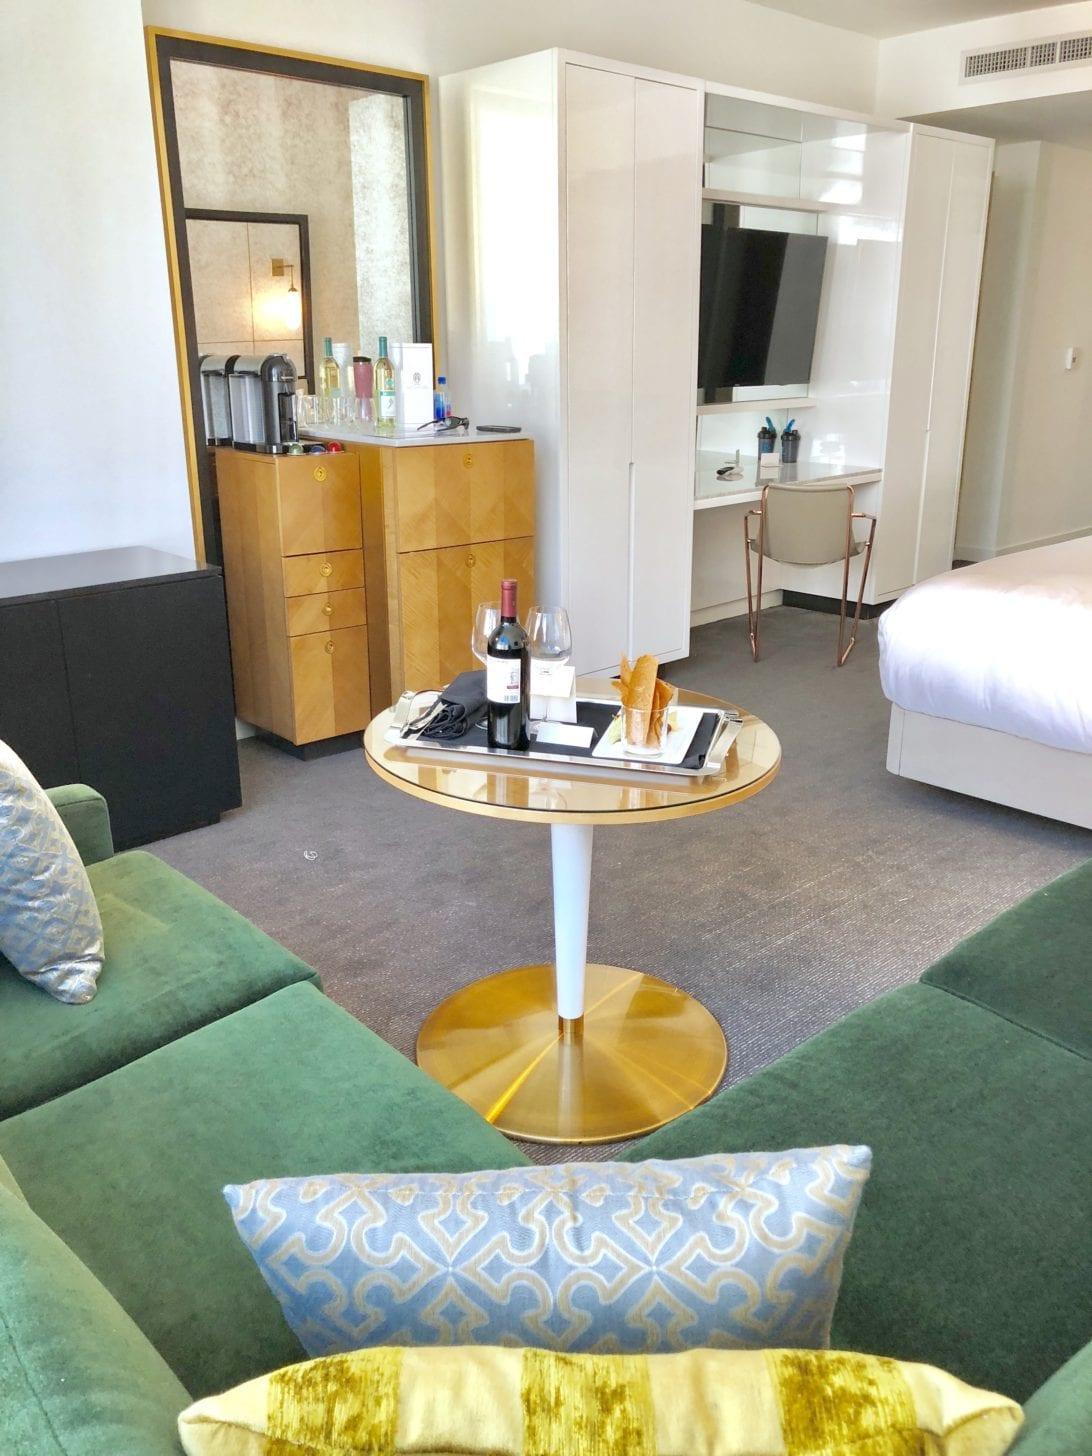 hotel Alessandra, luxury hotel, downtown Houston, Houston hotels, hotels for couples, staycation hotel